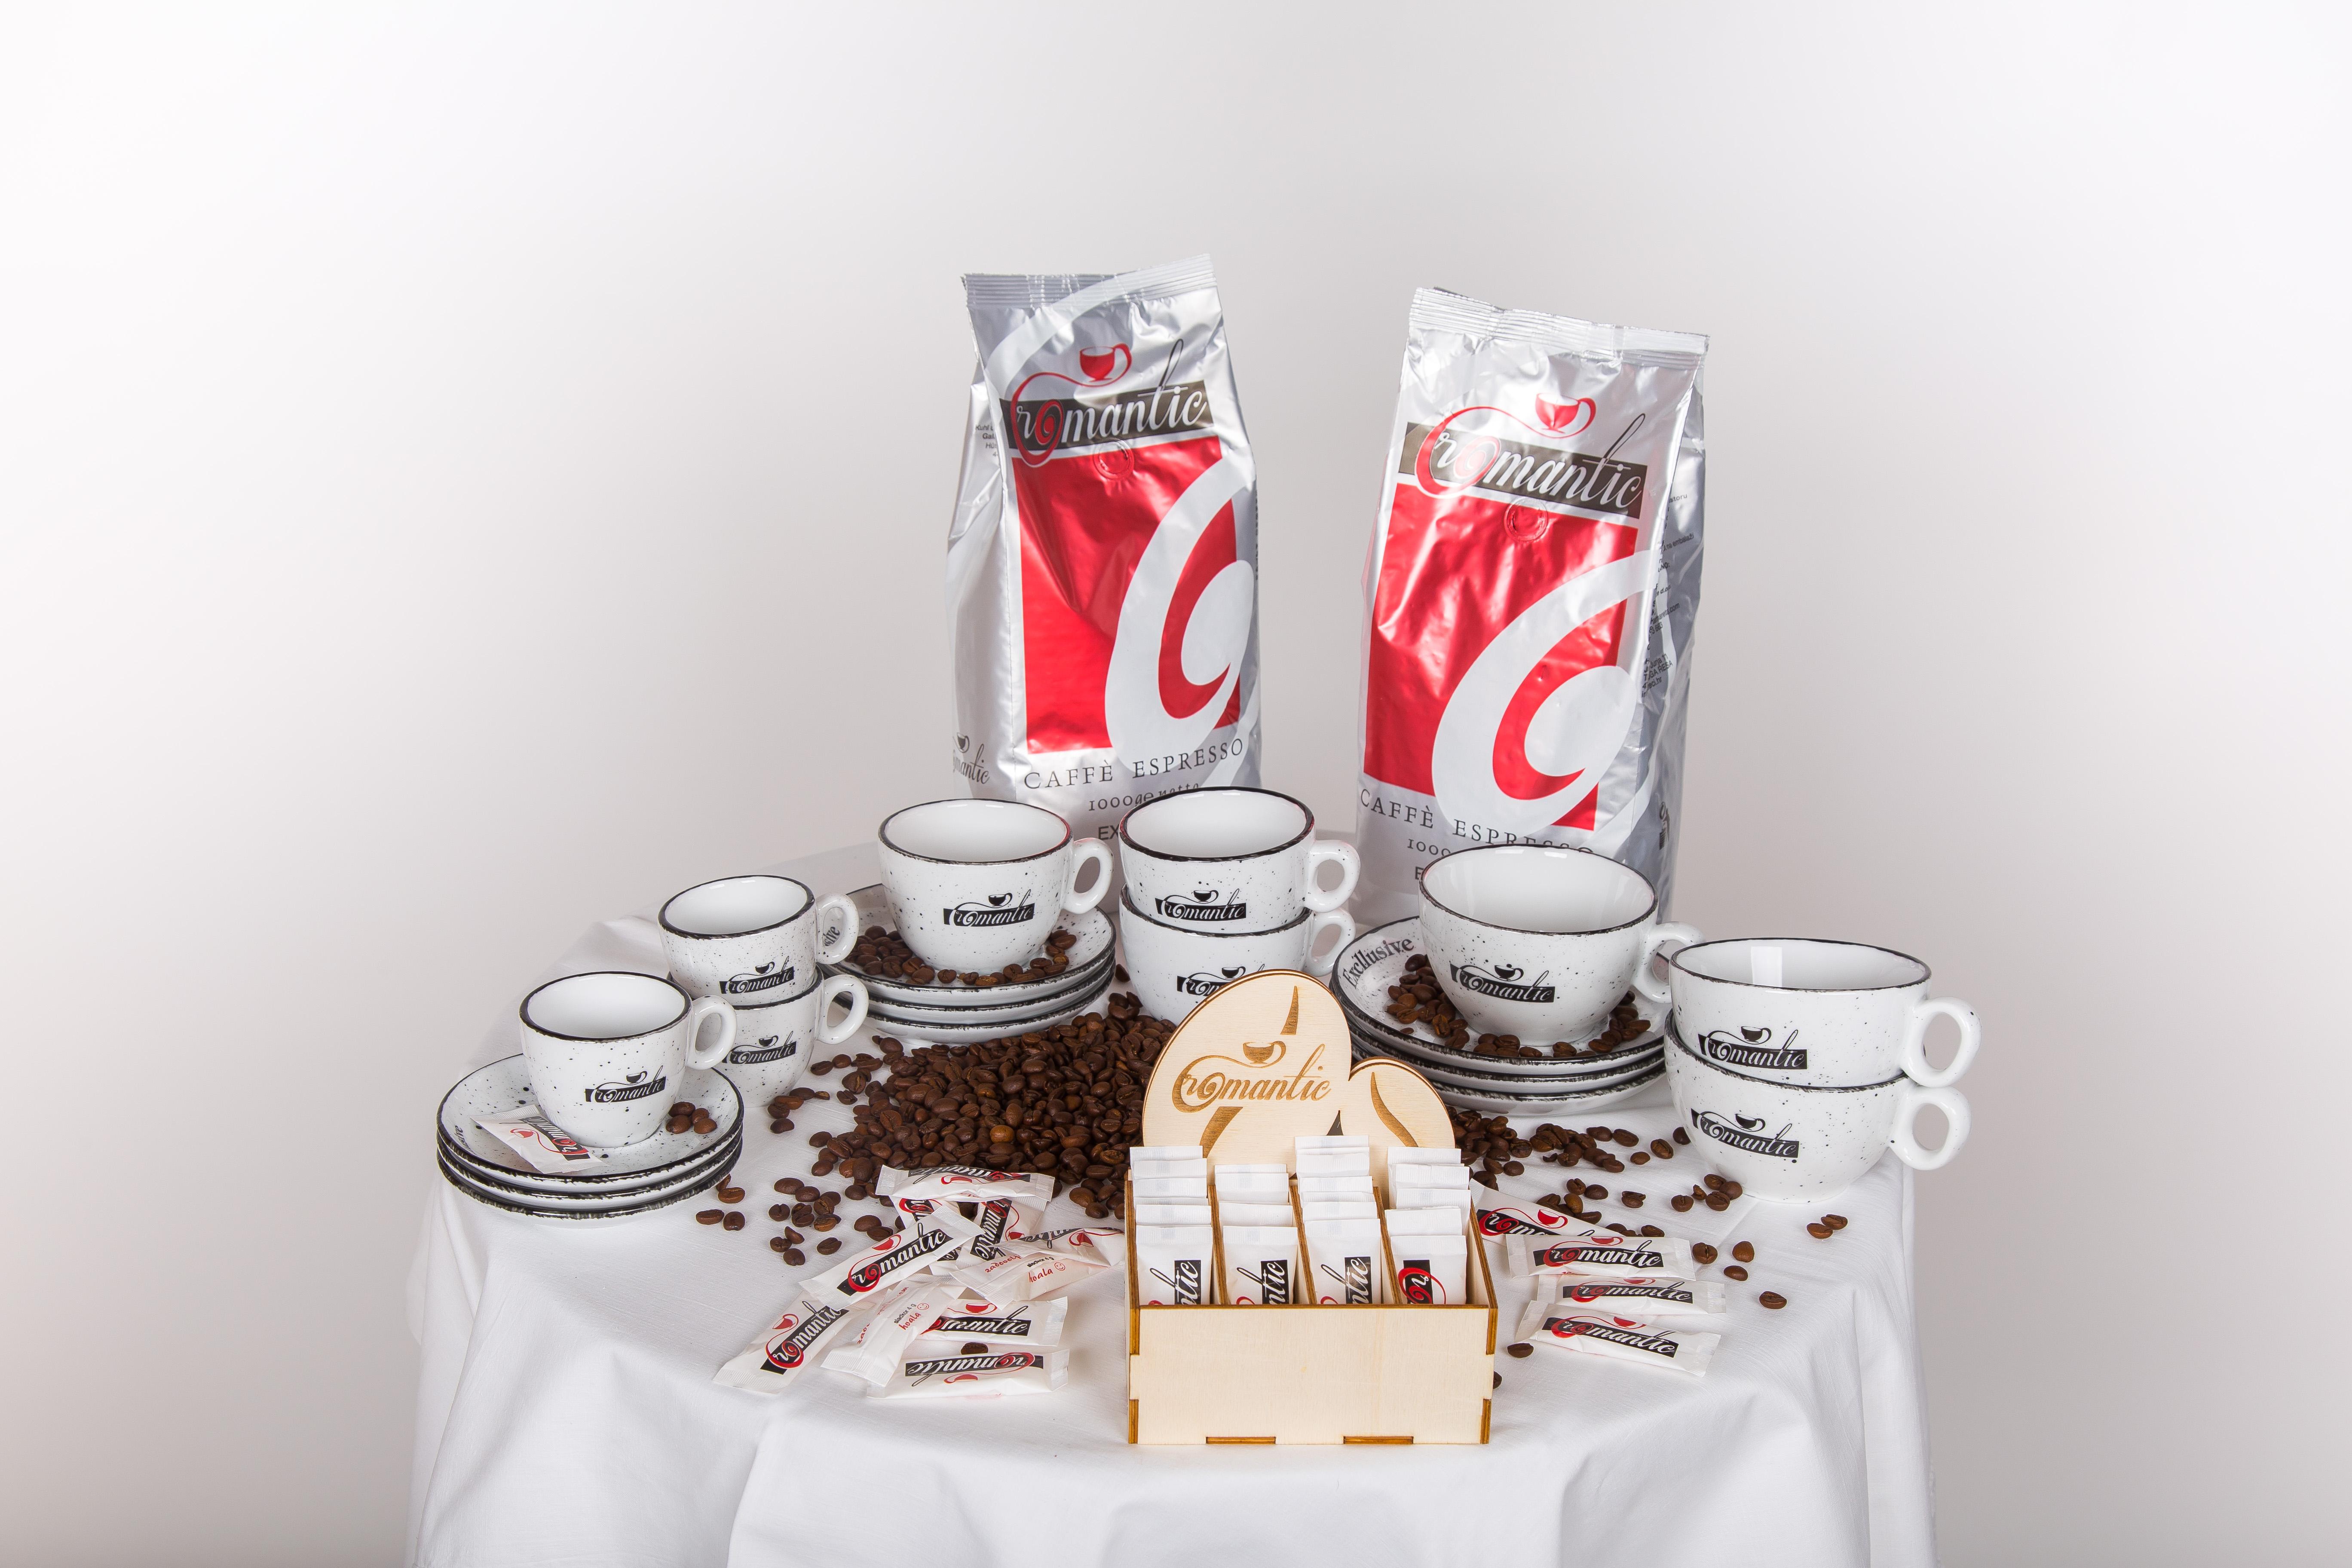 romantic sladkor